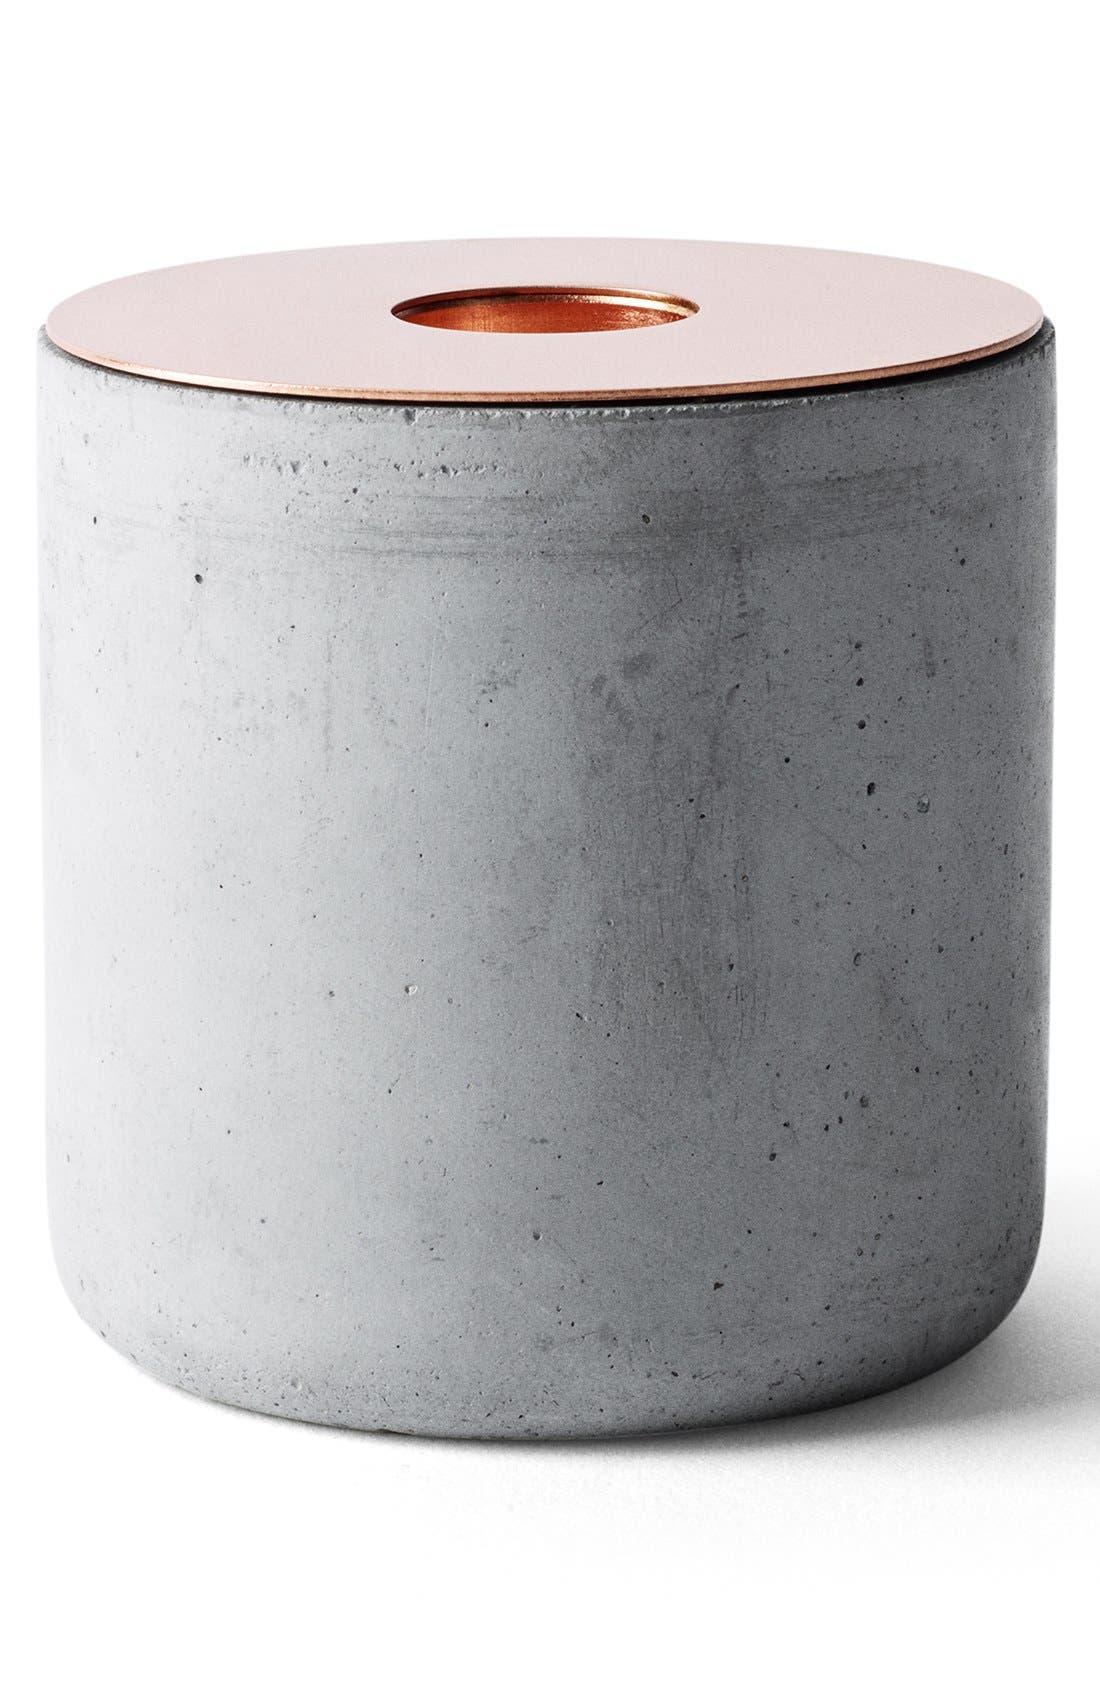 Alternate Image 2  - MENU 'Chunk of Concrete' Candlestick Holder